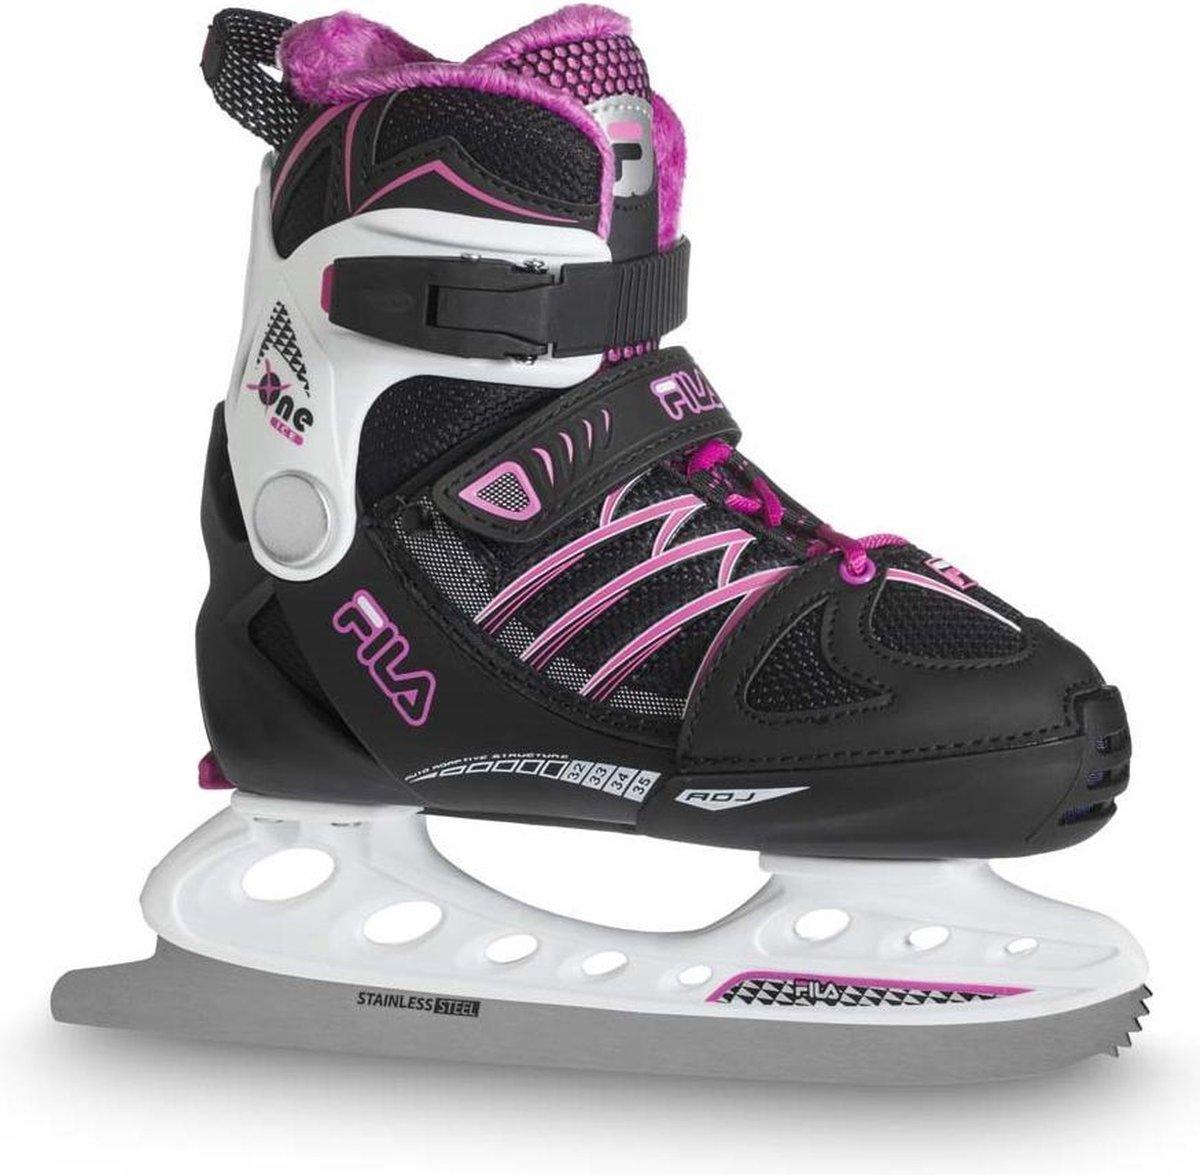 Fila Ijshockeyschaatsen X One Ice Meisjes Rvs/polyester Zwart Mt 29-32